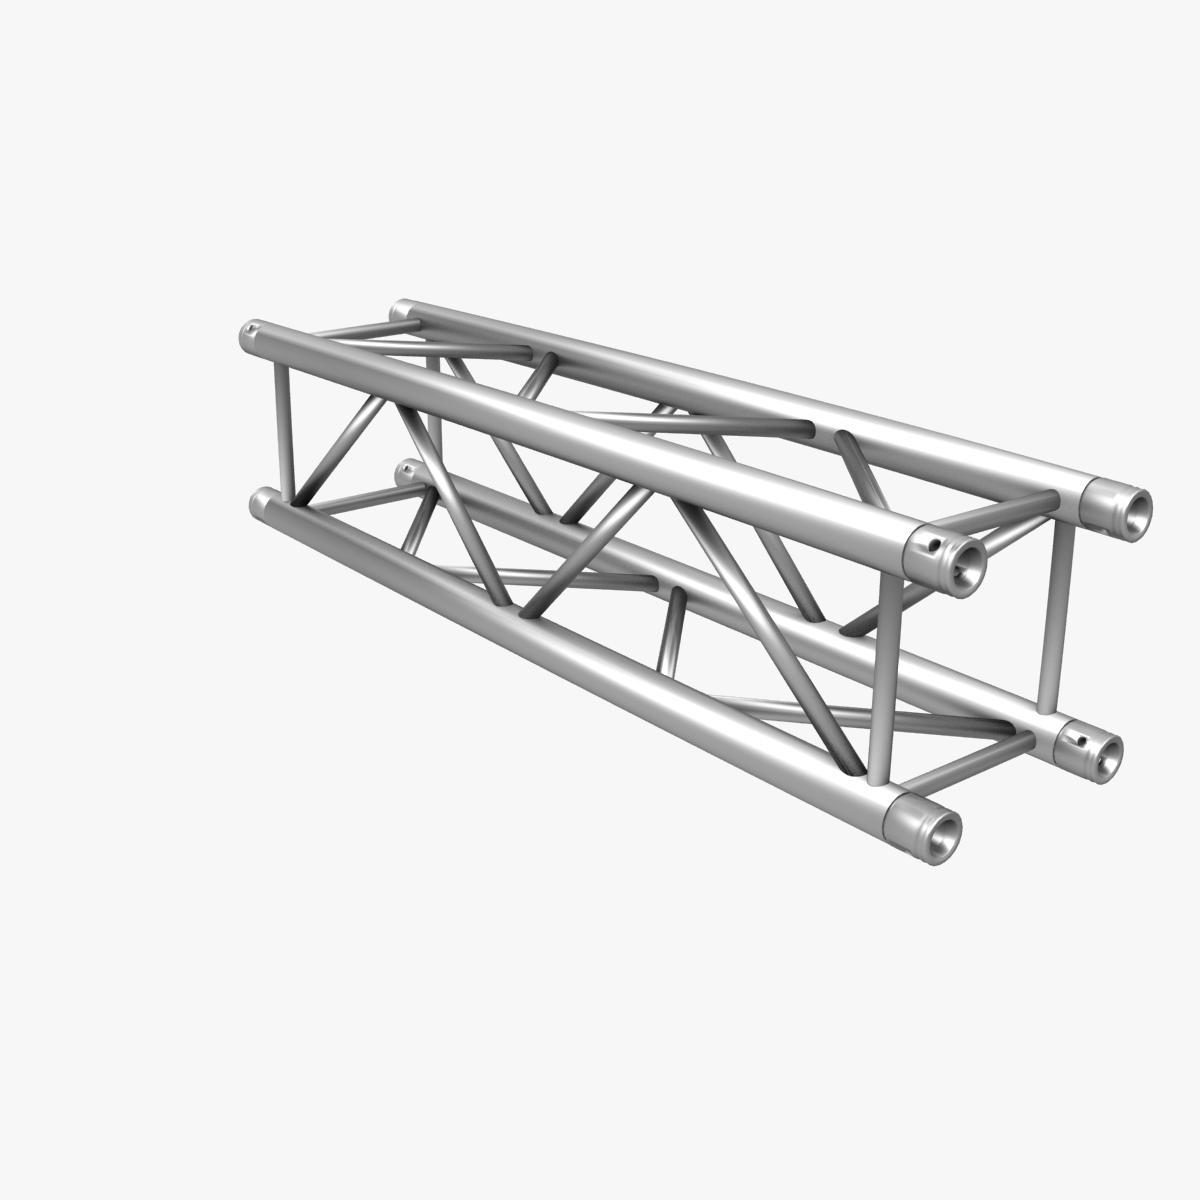 30-21_1200x1200_05.jpg Download free STL file Square Truss Straight Segment 21 • 3D printable object, akerStudio